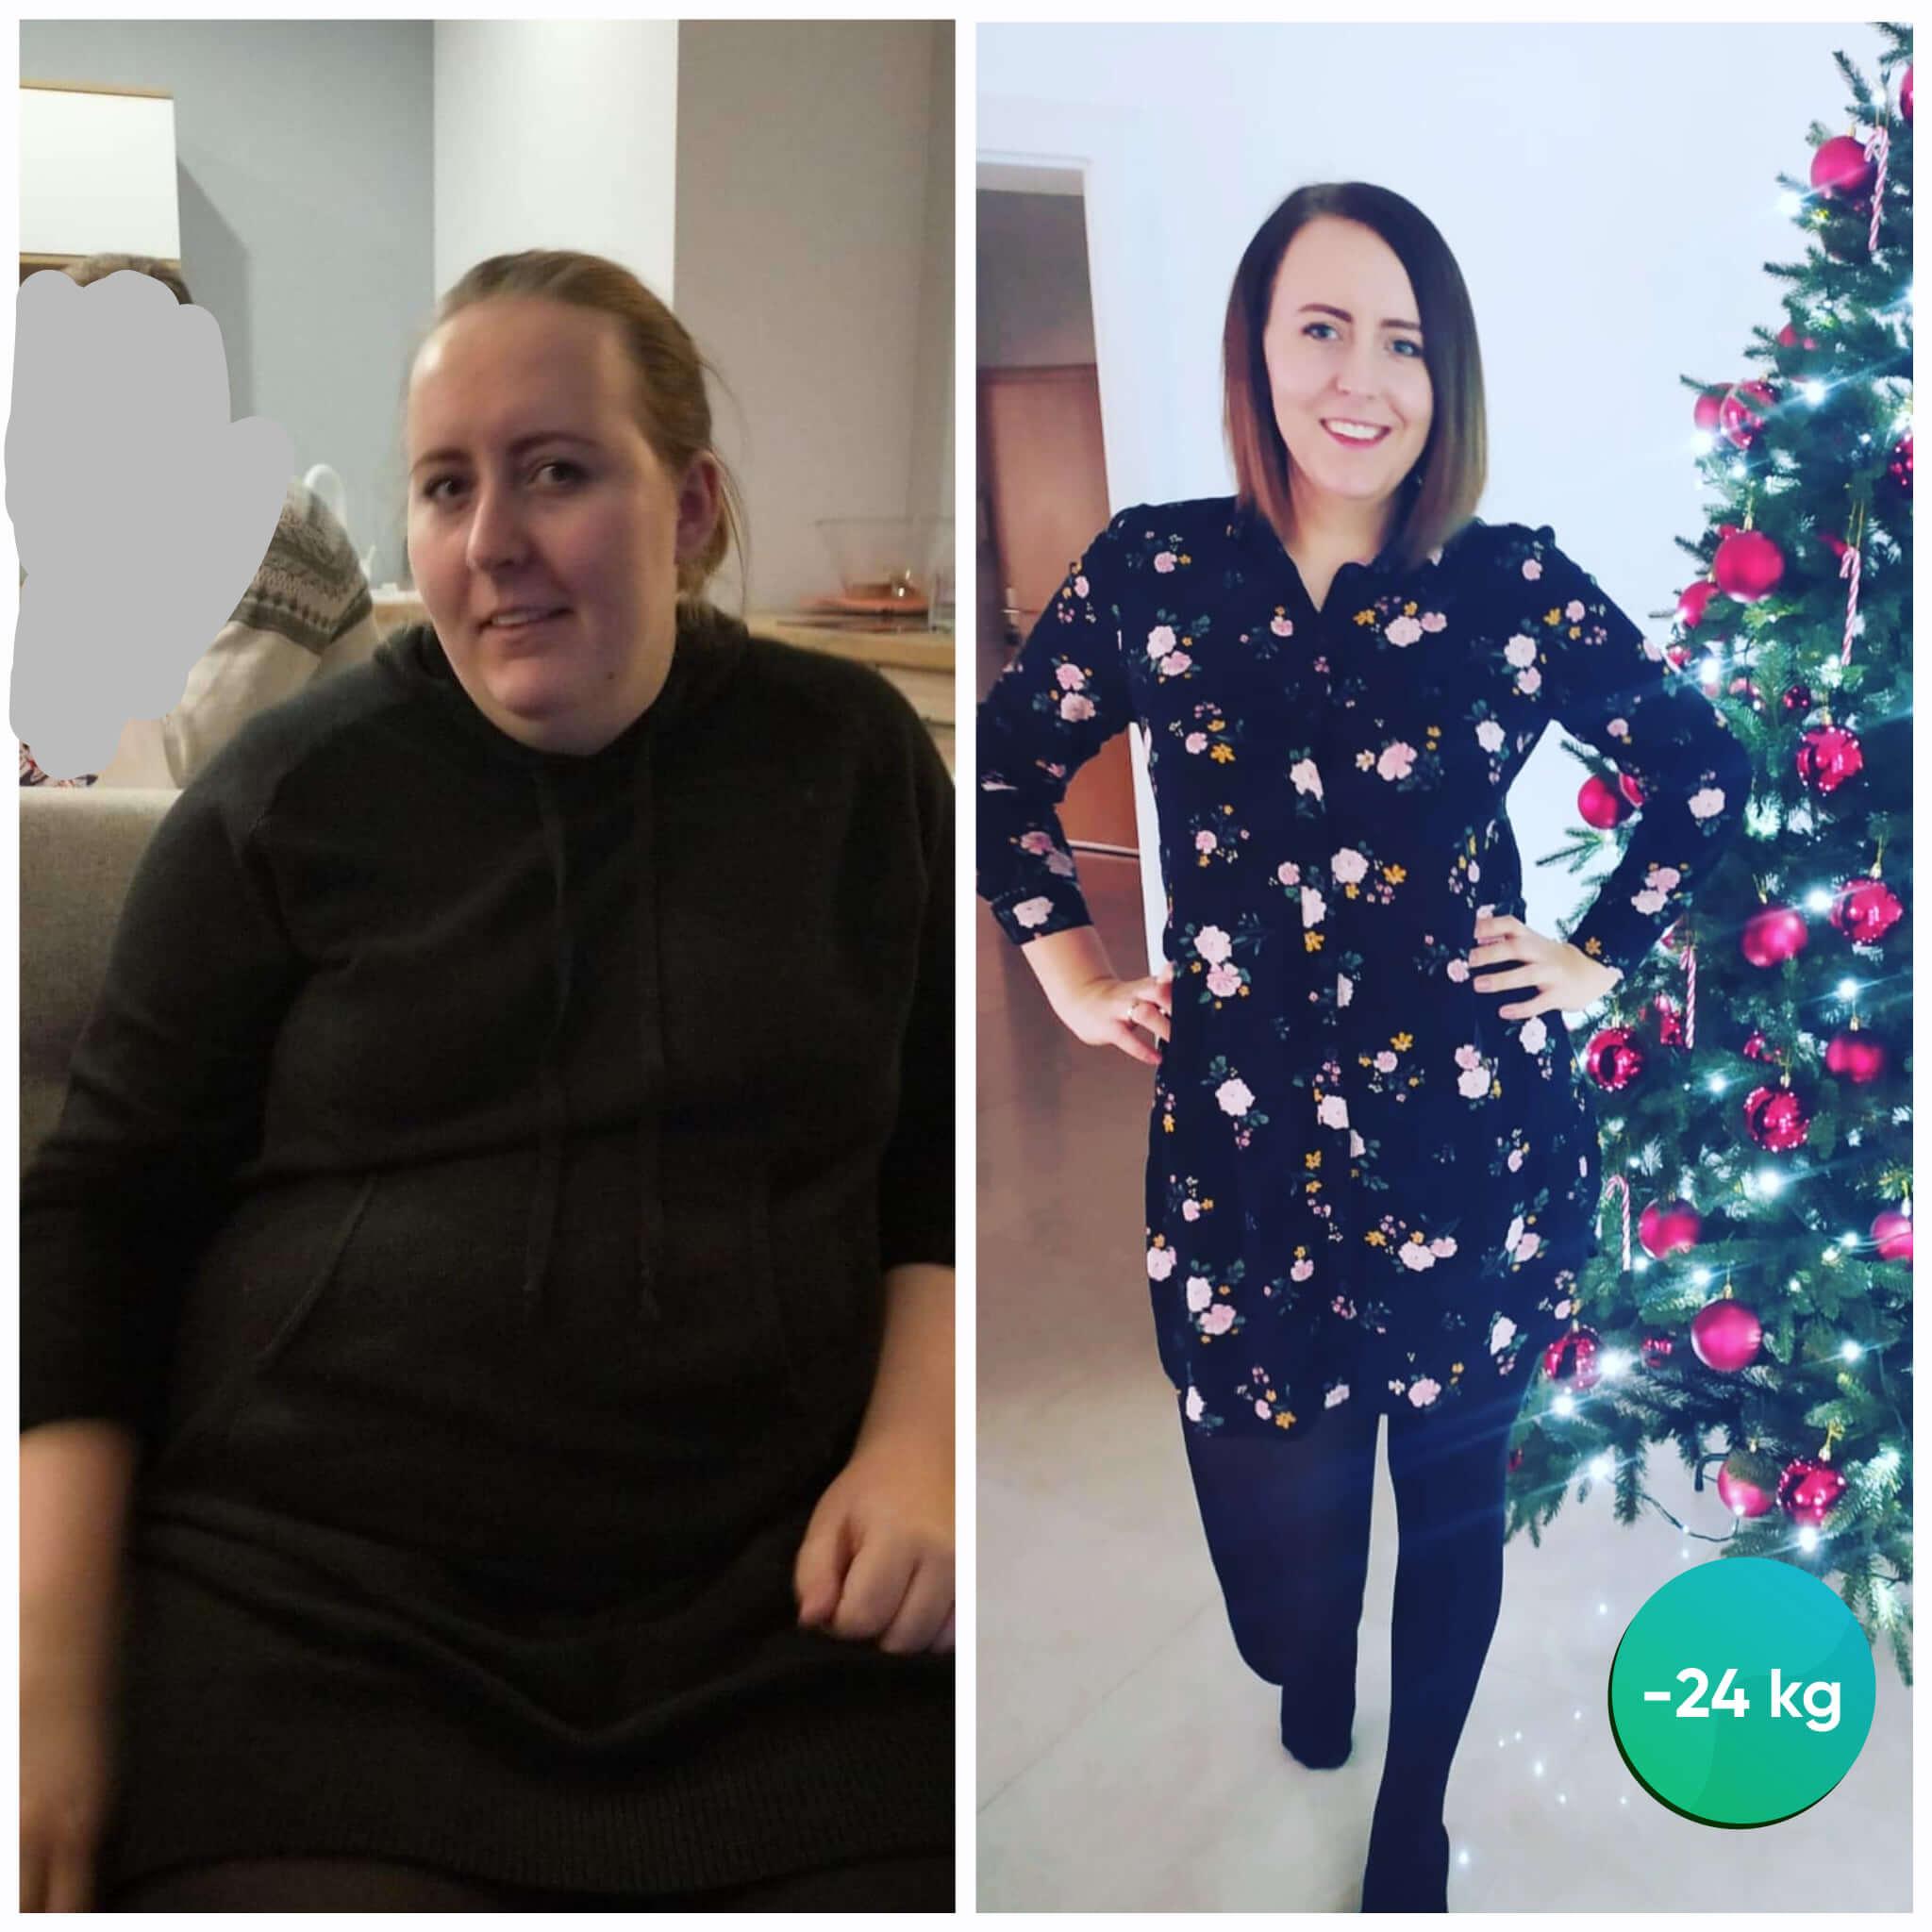 Justyna -24 kg